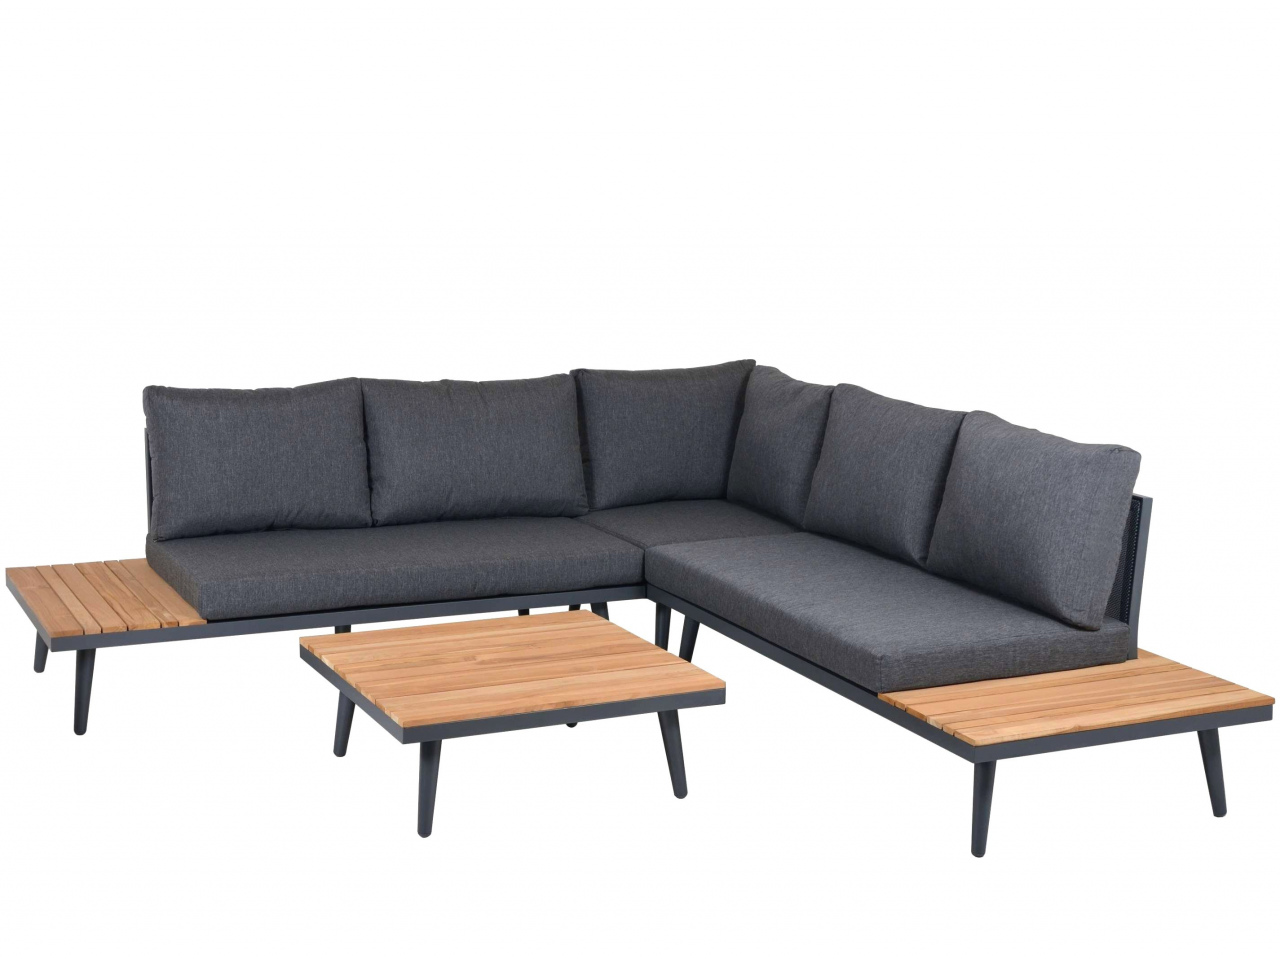 Full Size of Gartensofa Tchibo 2 In 1 Komfort Sofa Selber Bauen Zuhause Wohnzimmer Gartensofa Tchibo